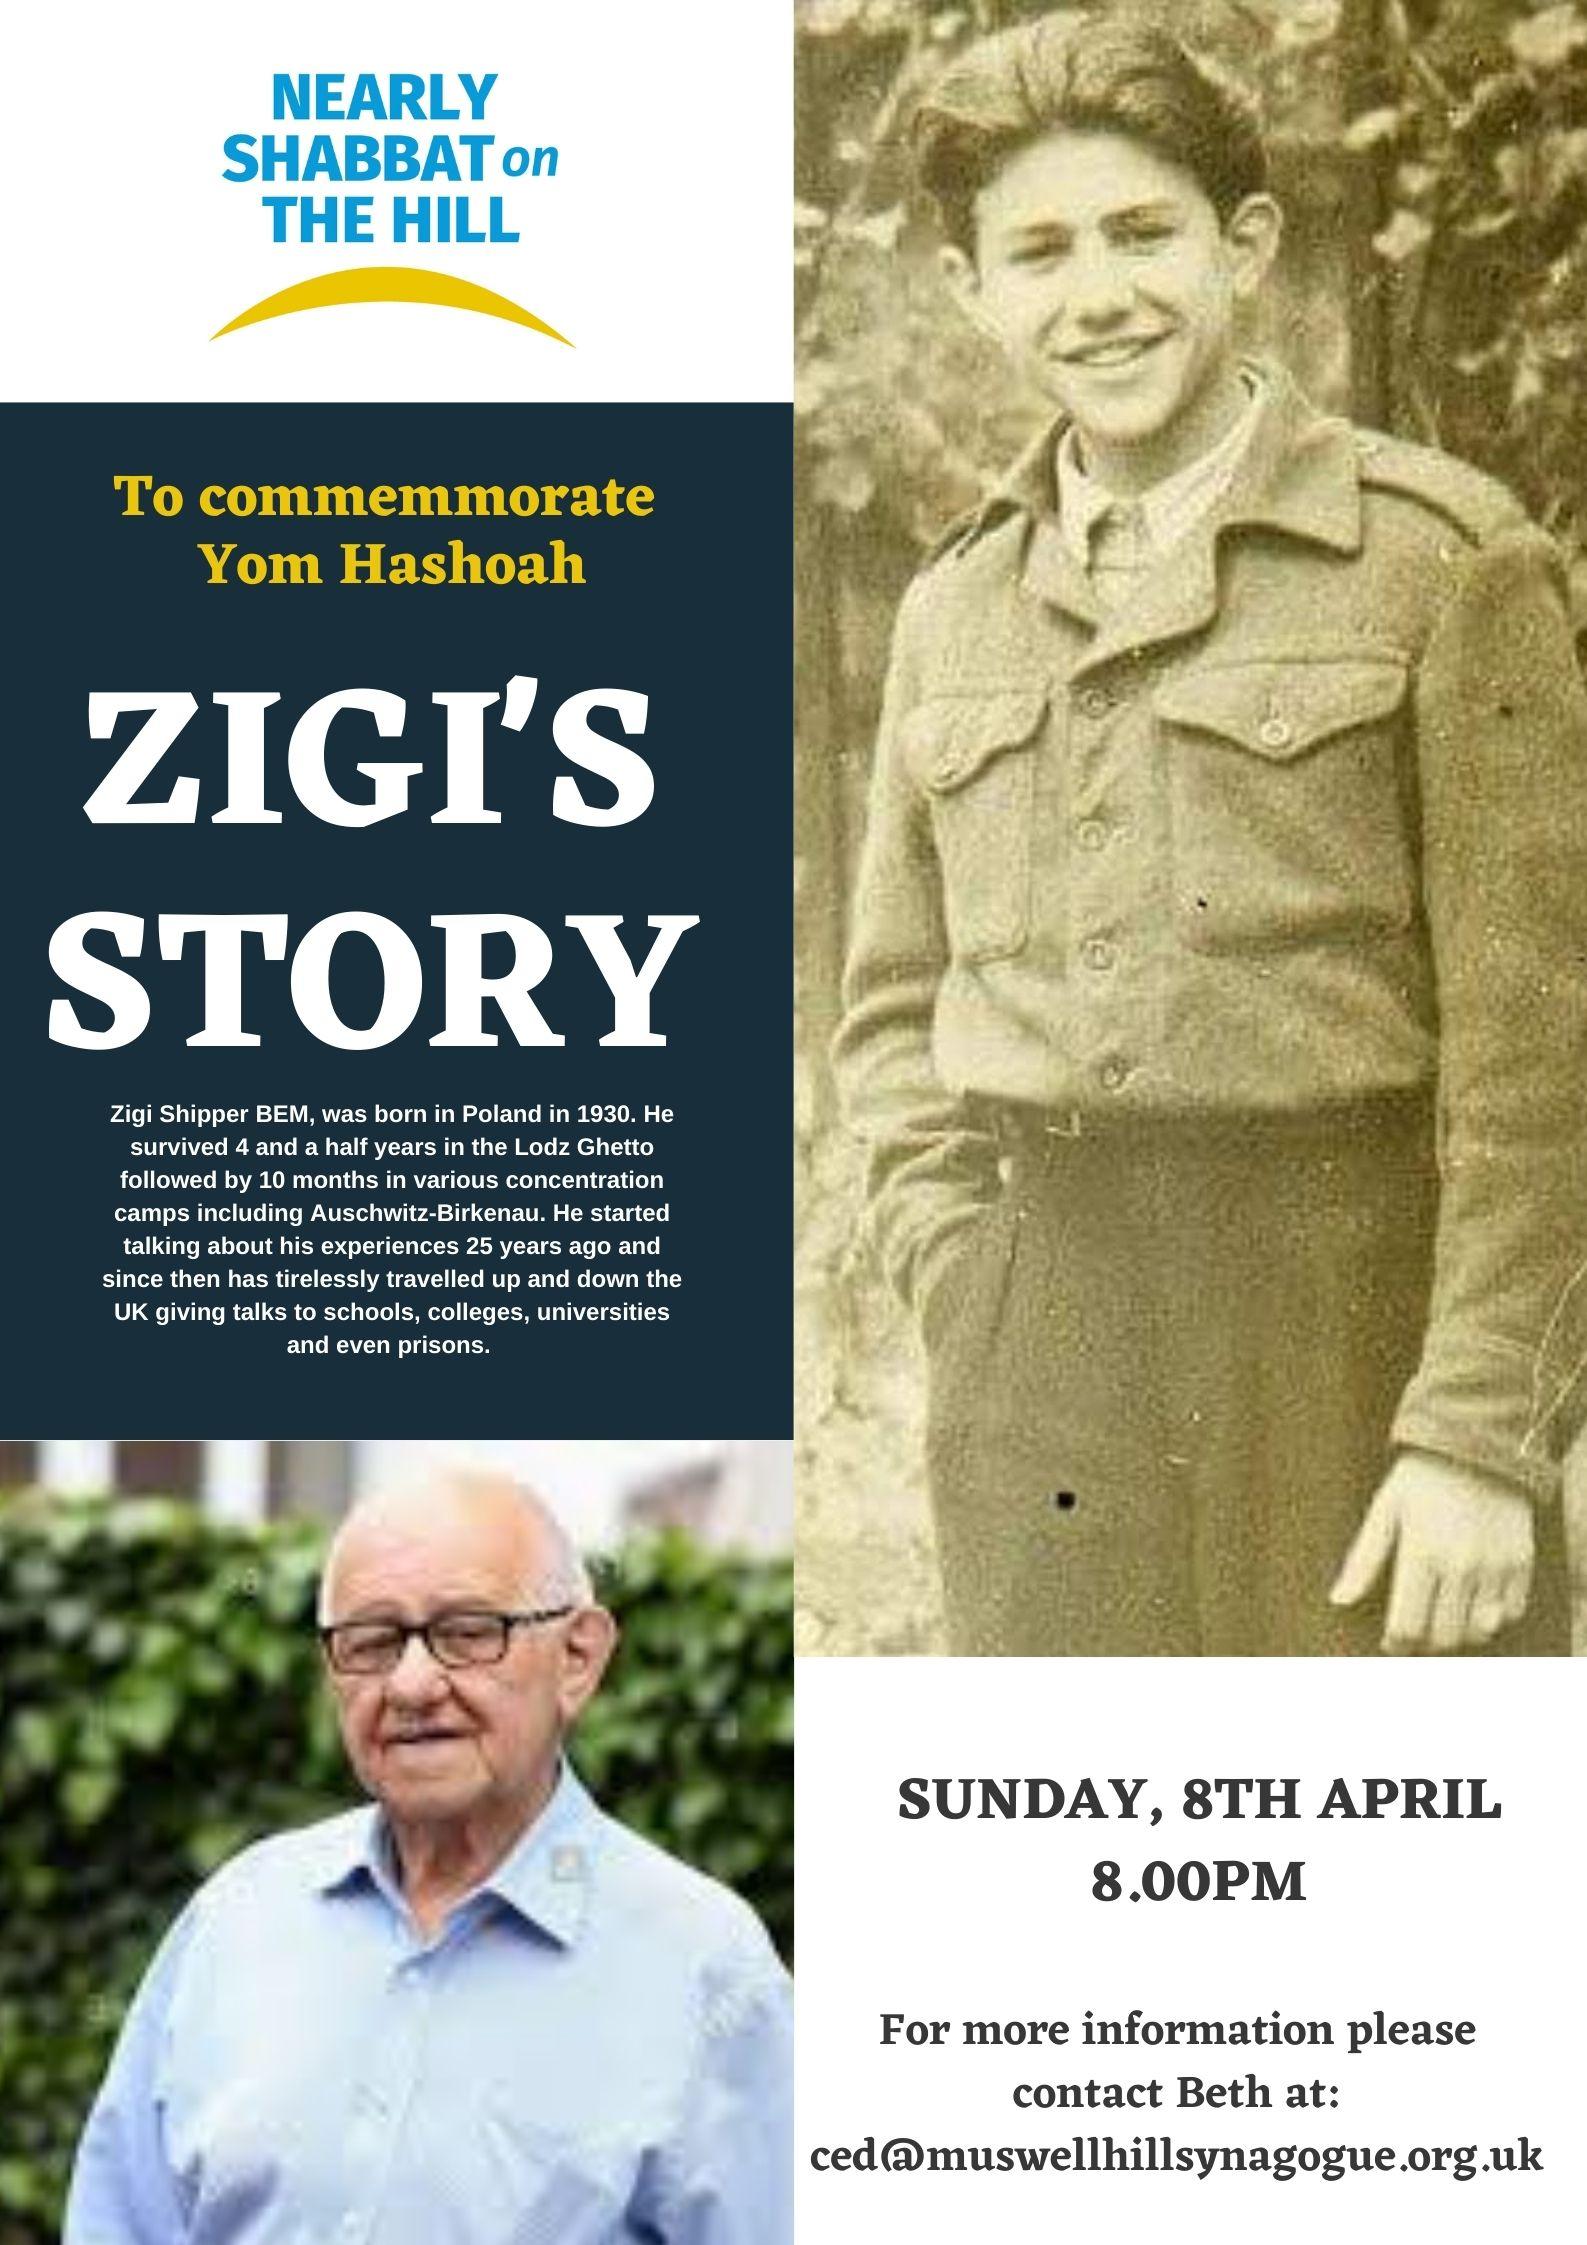 Zigi's story